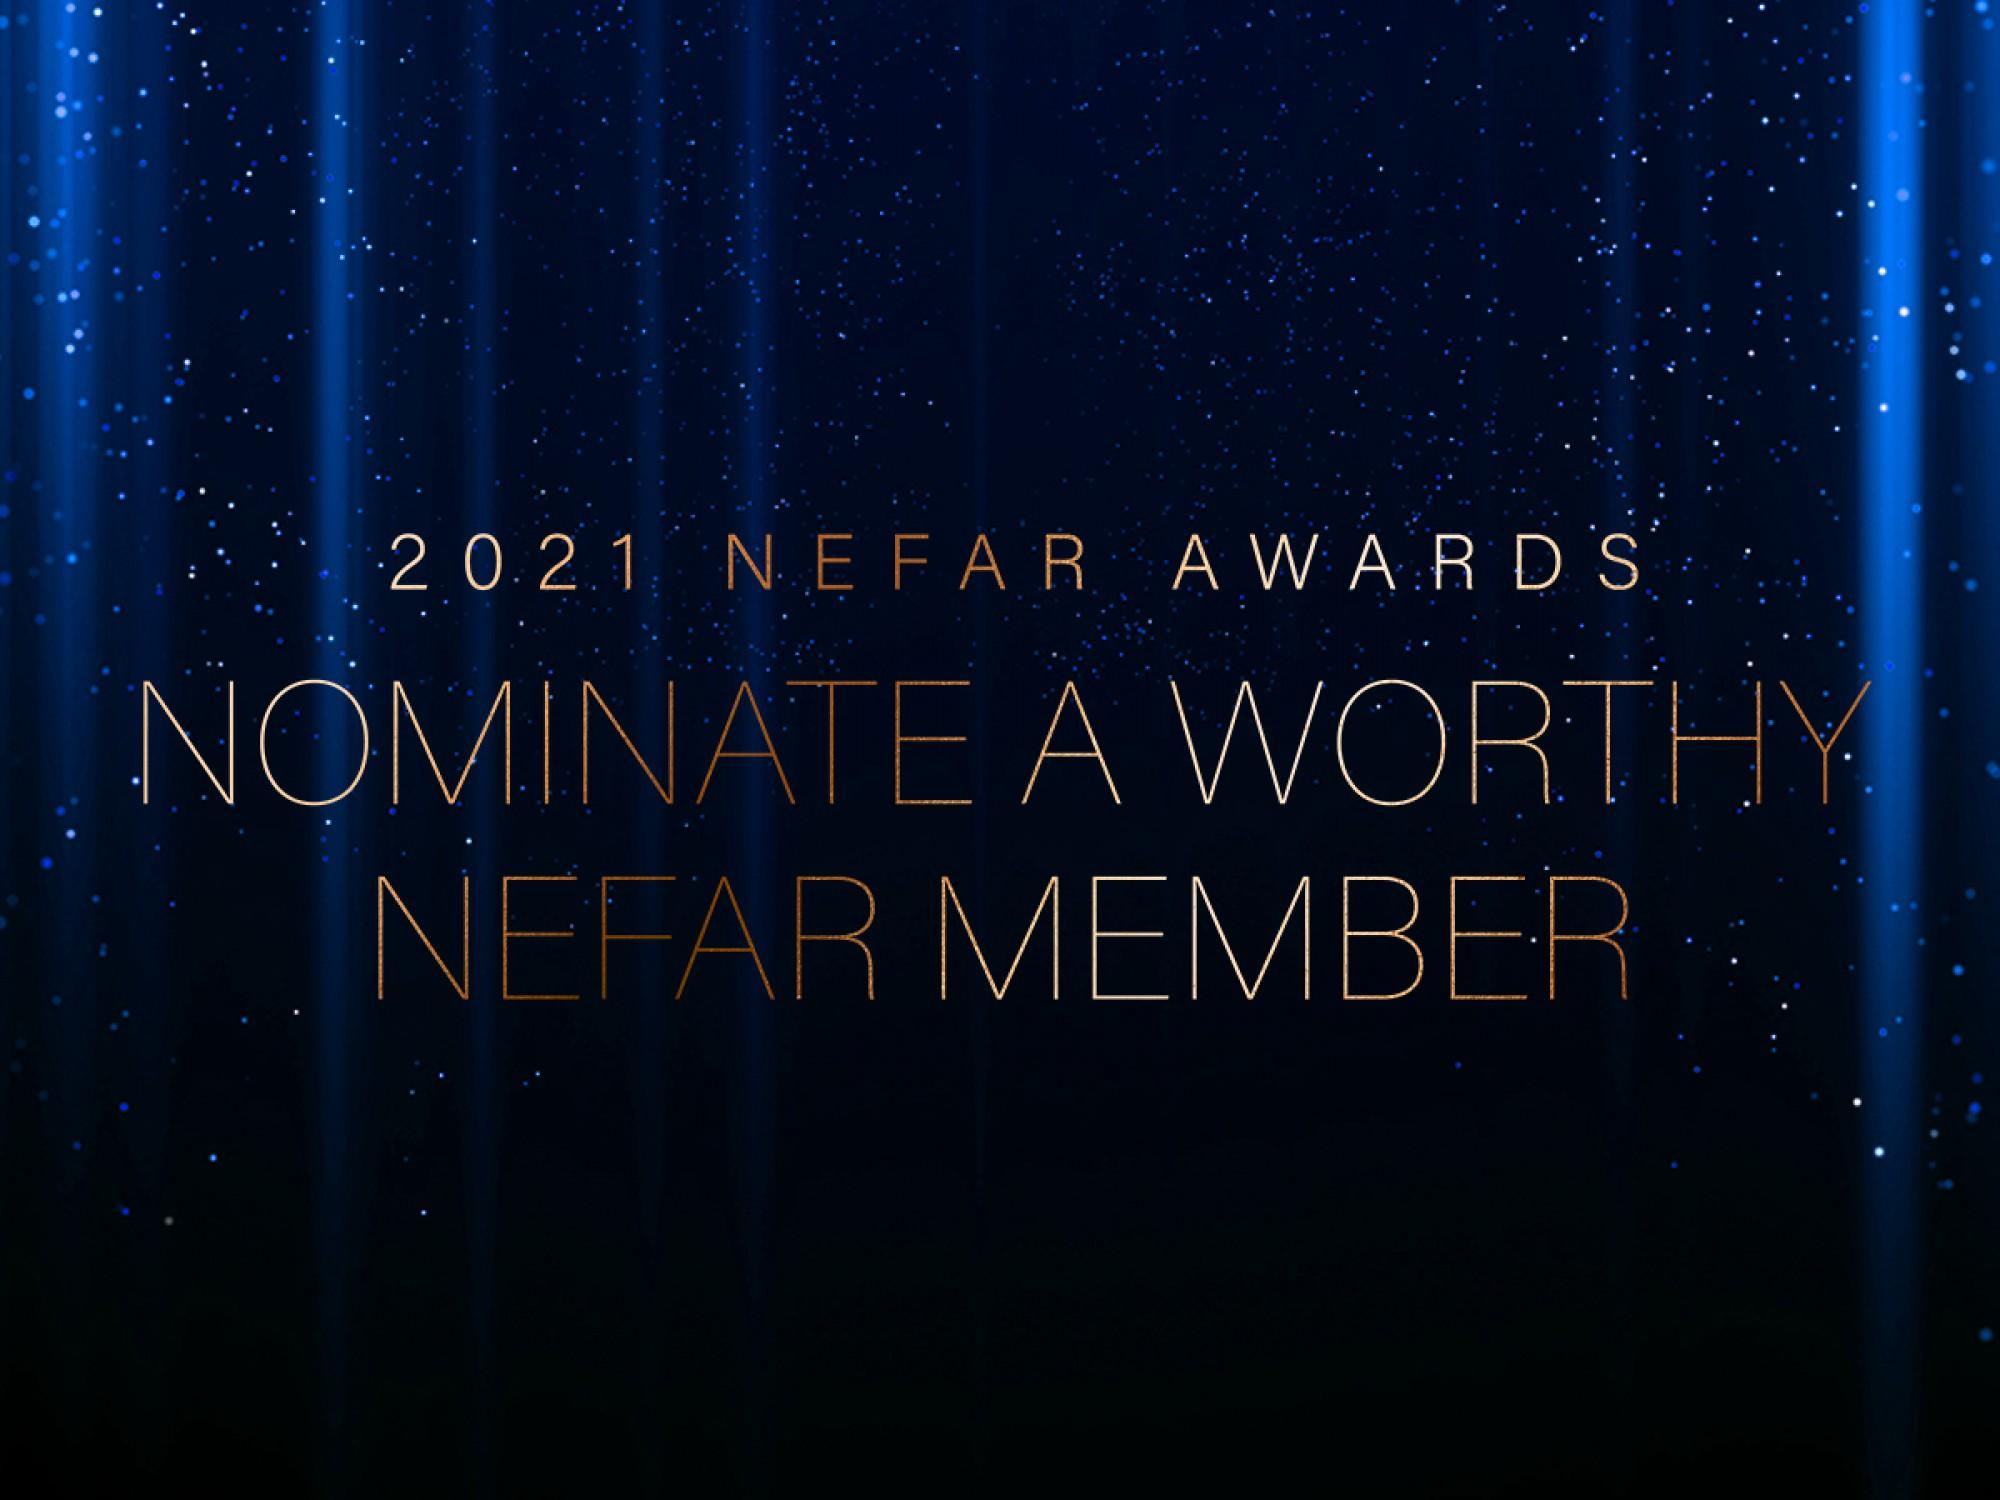 Help identify NEFAR's award winners for 2021